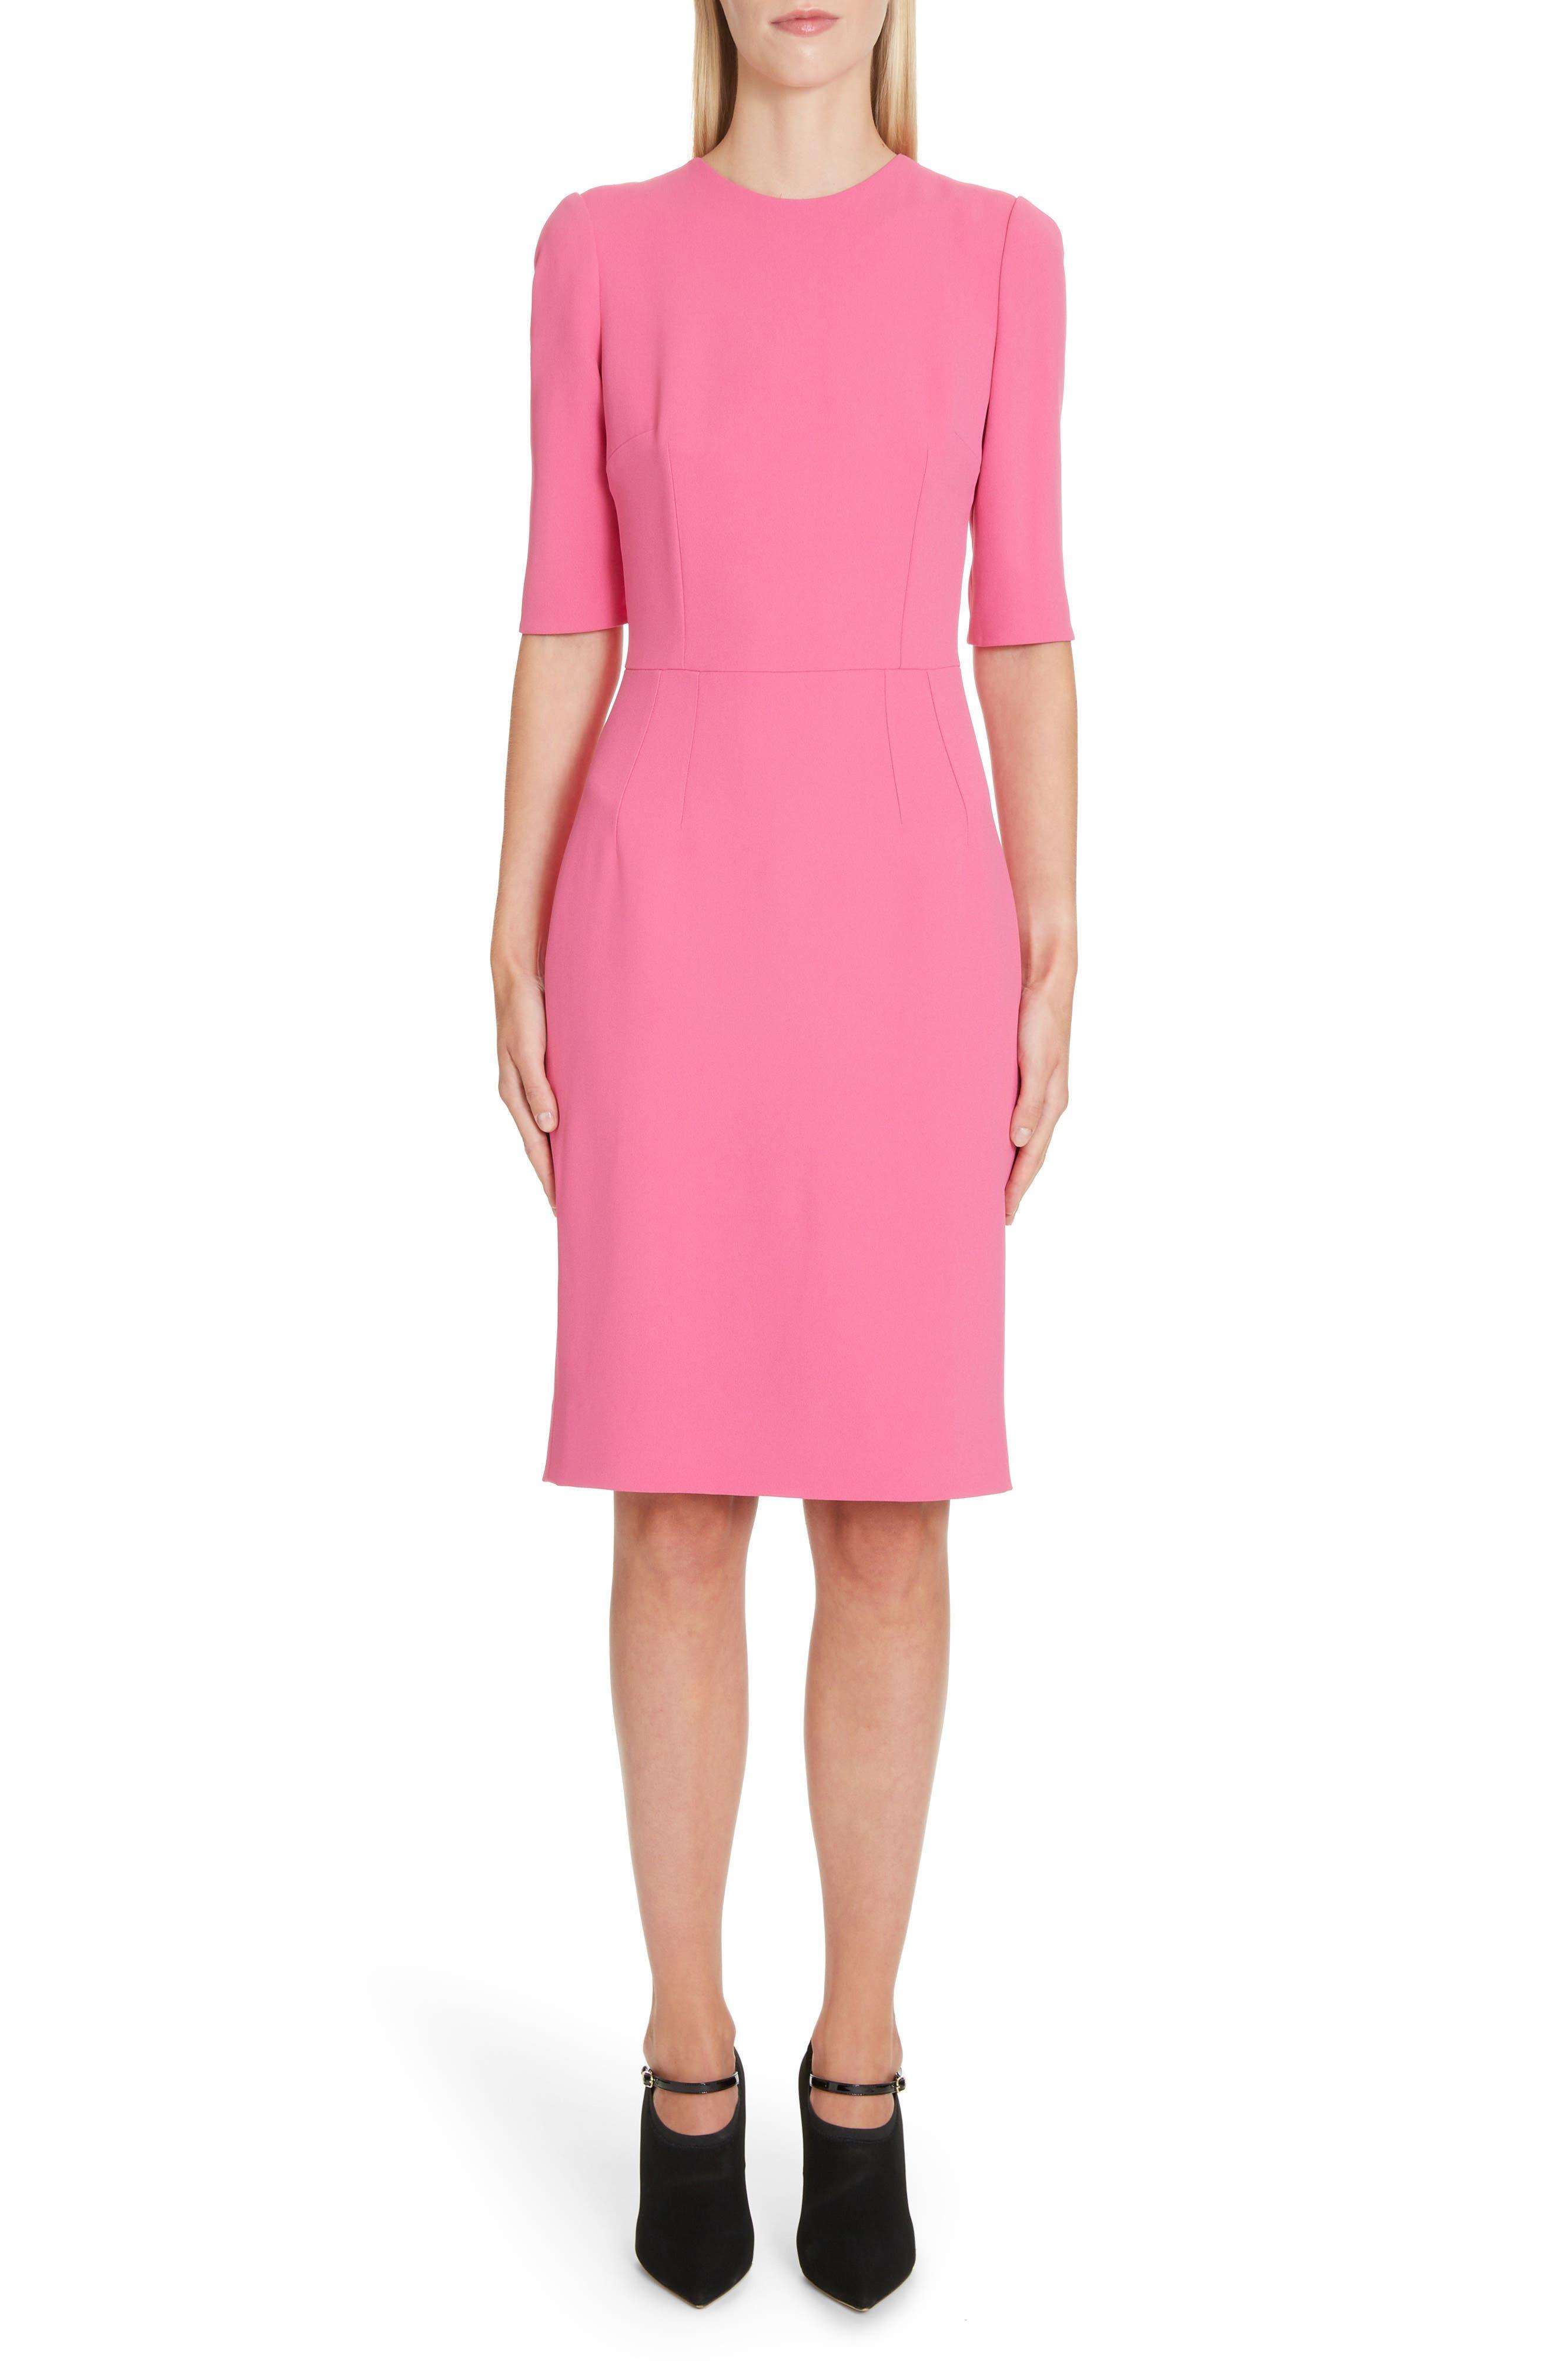 Dolce & gabbana Cady Sheath Dress, US / 42 IT - Pink